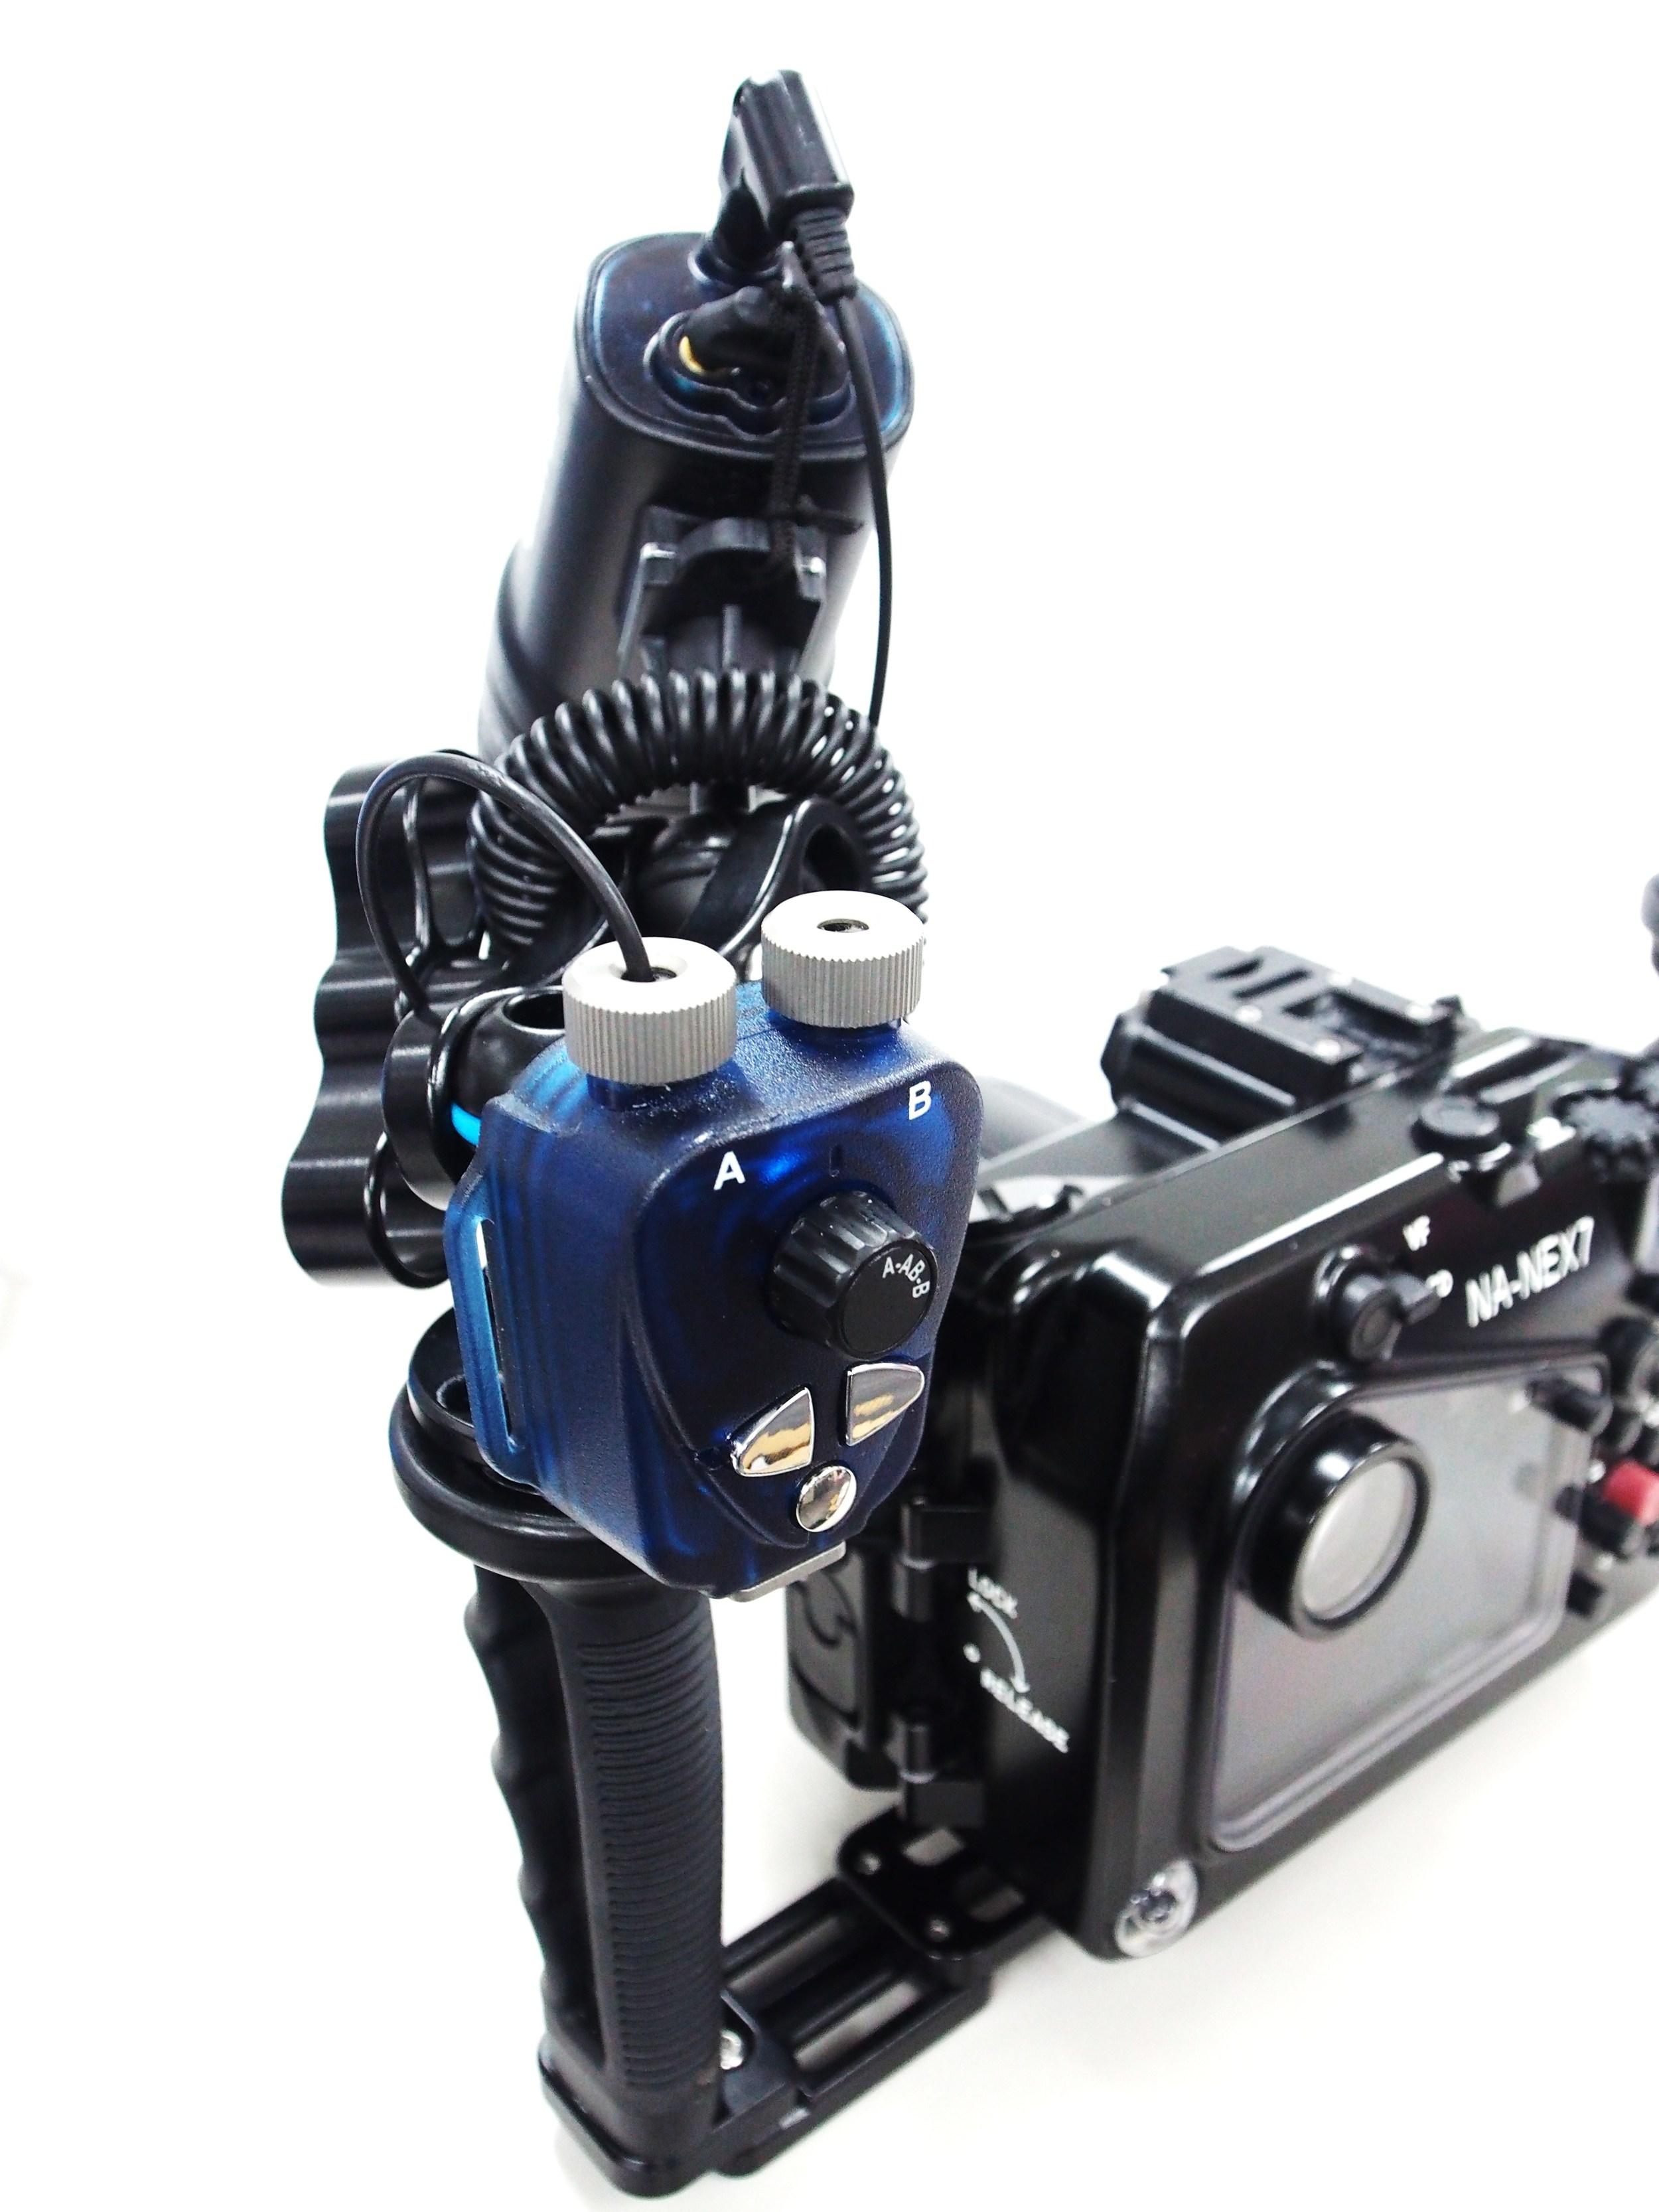 FR1-controller-main-image.jpg